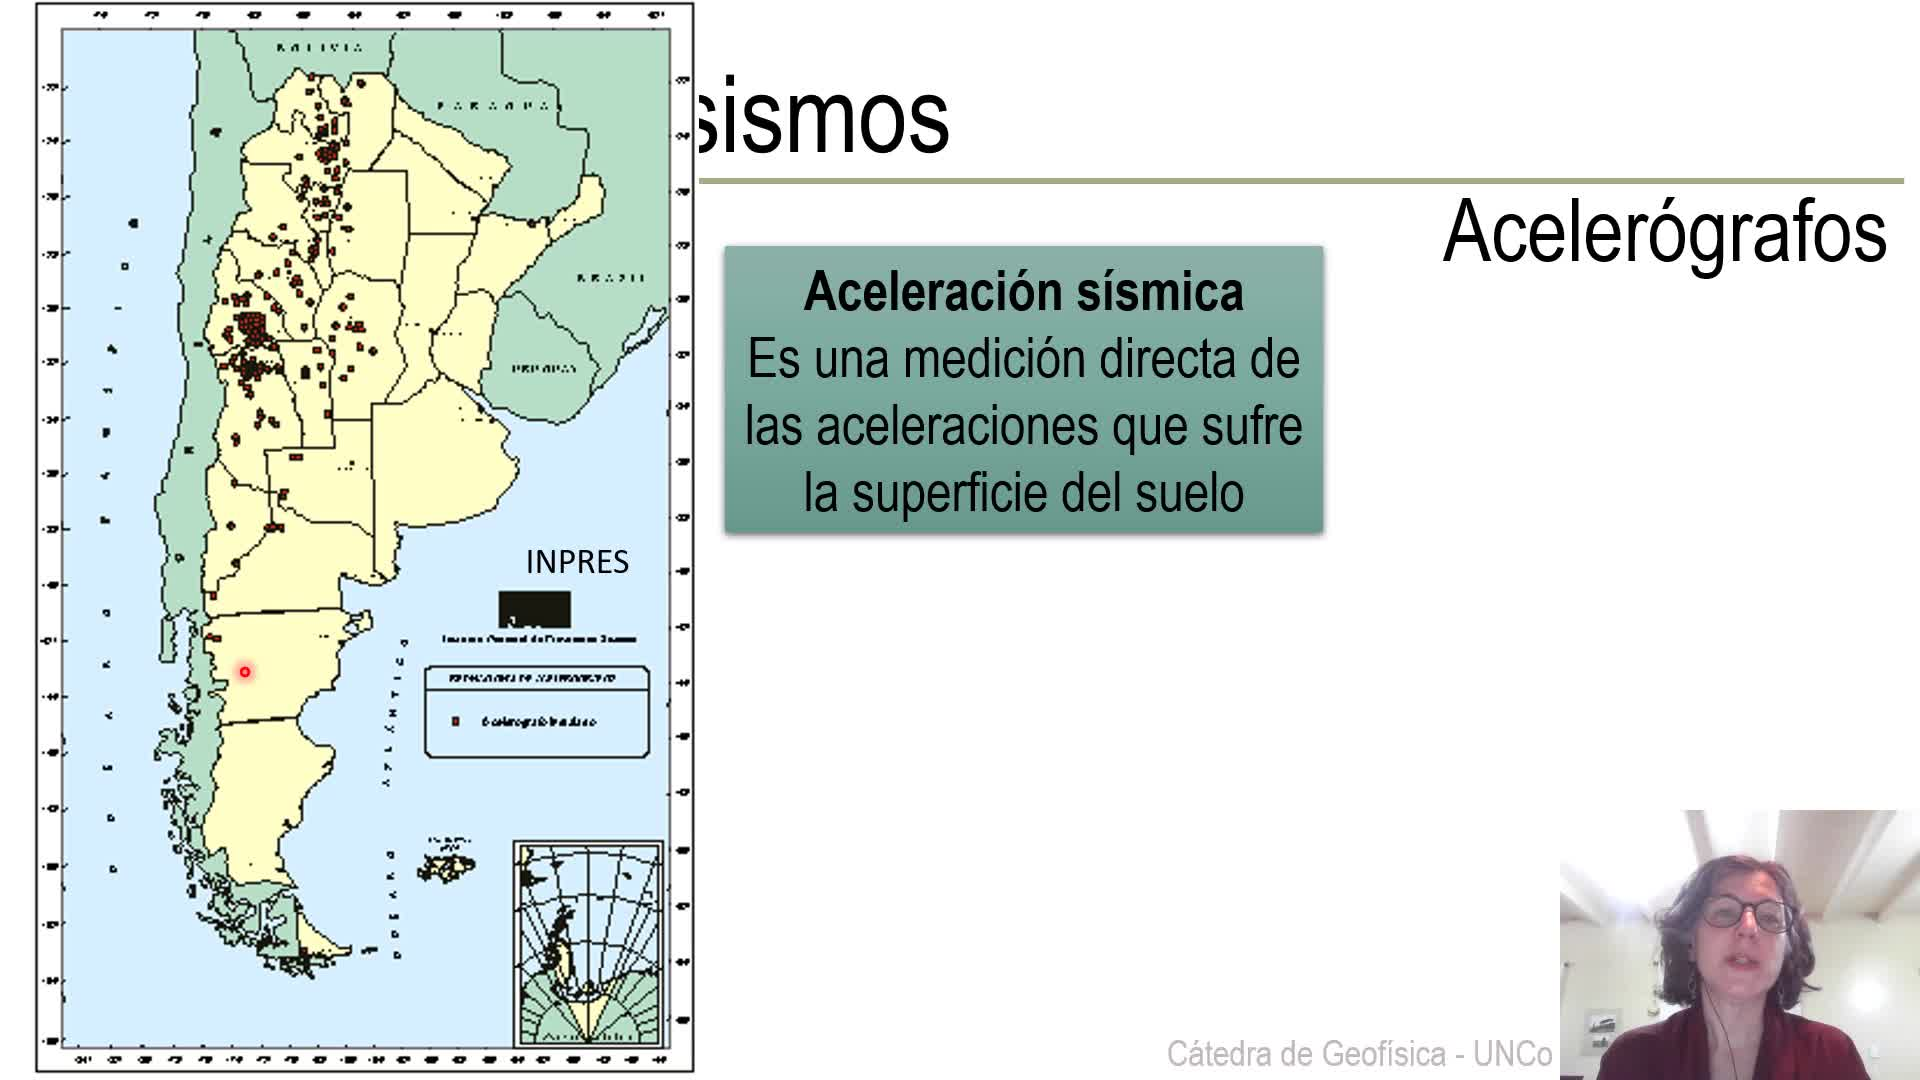 Geofísica - Sismología natural - Clase teórica (2 de2)